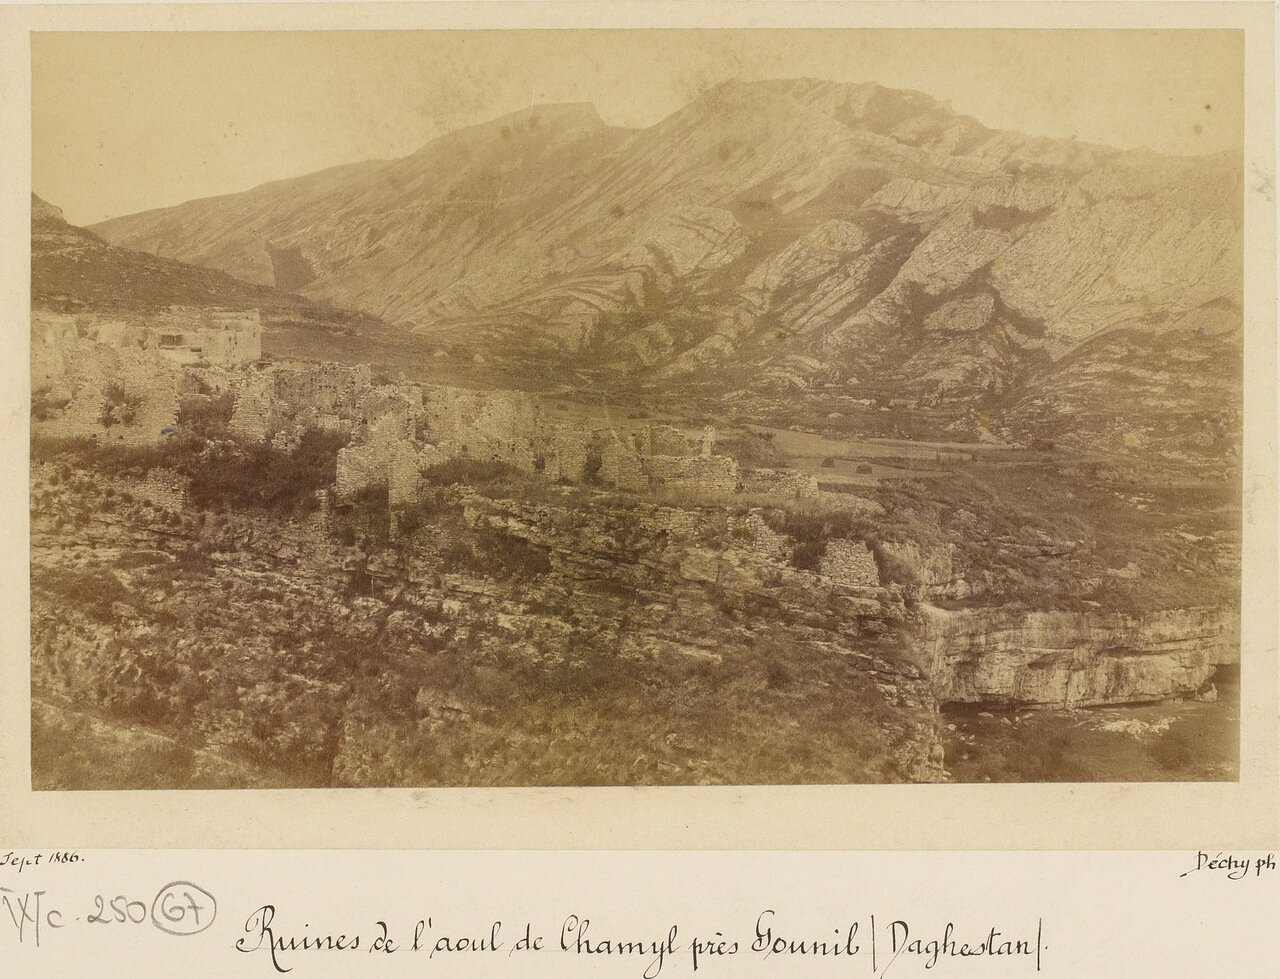 Руины шамилевского аула Гуниб (Дагестан)